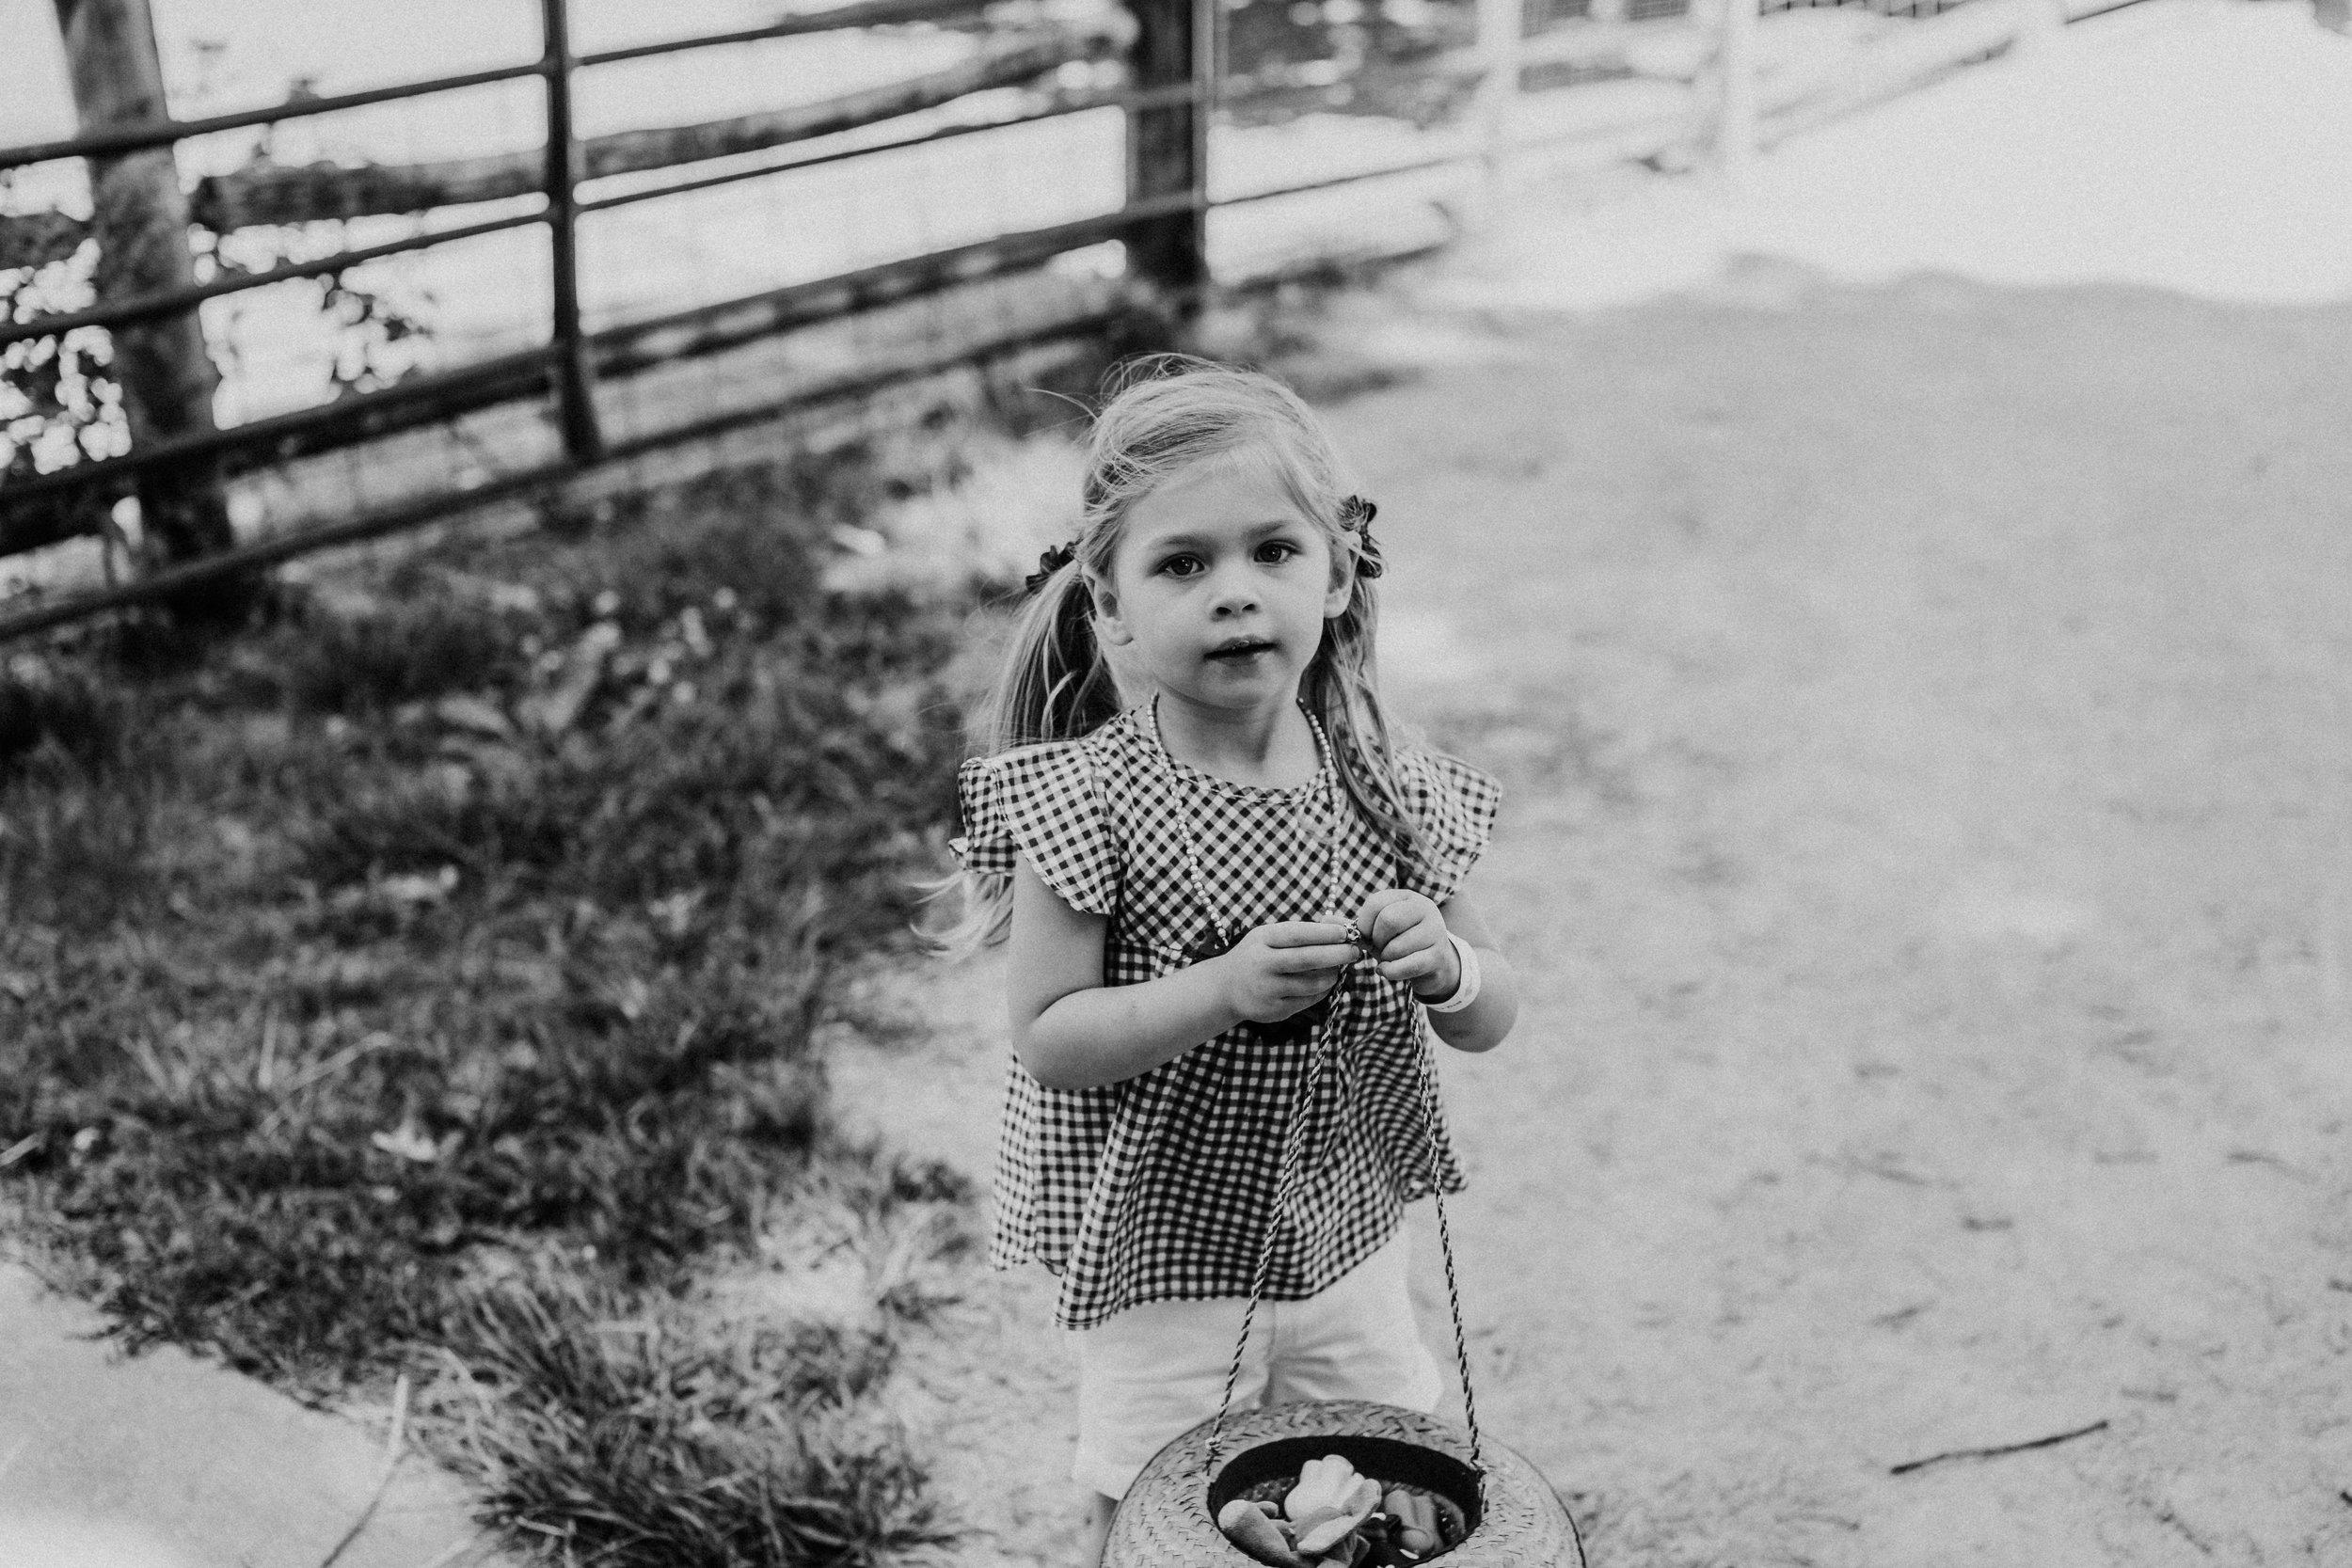 Black and farm birthday party Kate's 3rd Birthday | Hanna Hill Photography | Durham, NC Family Photographer